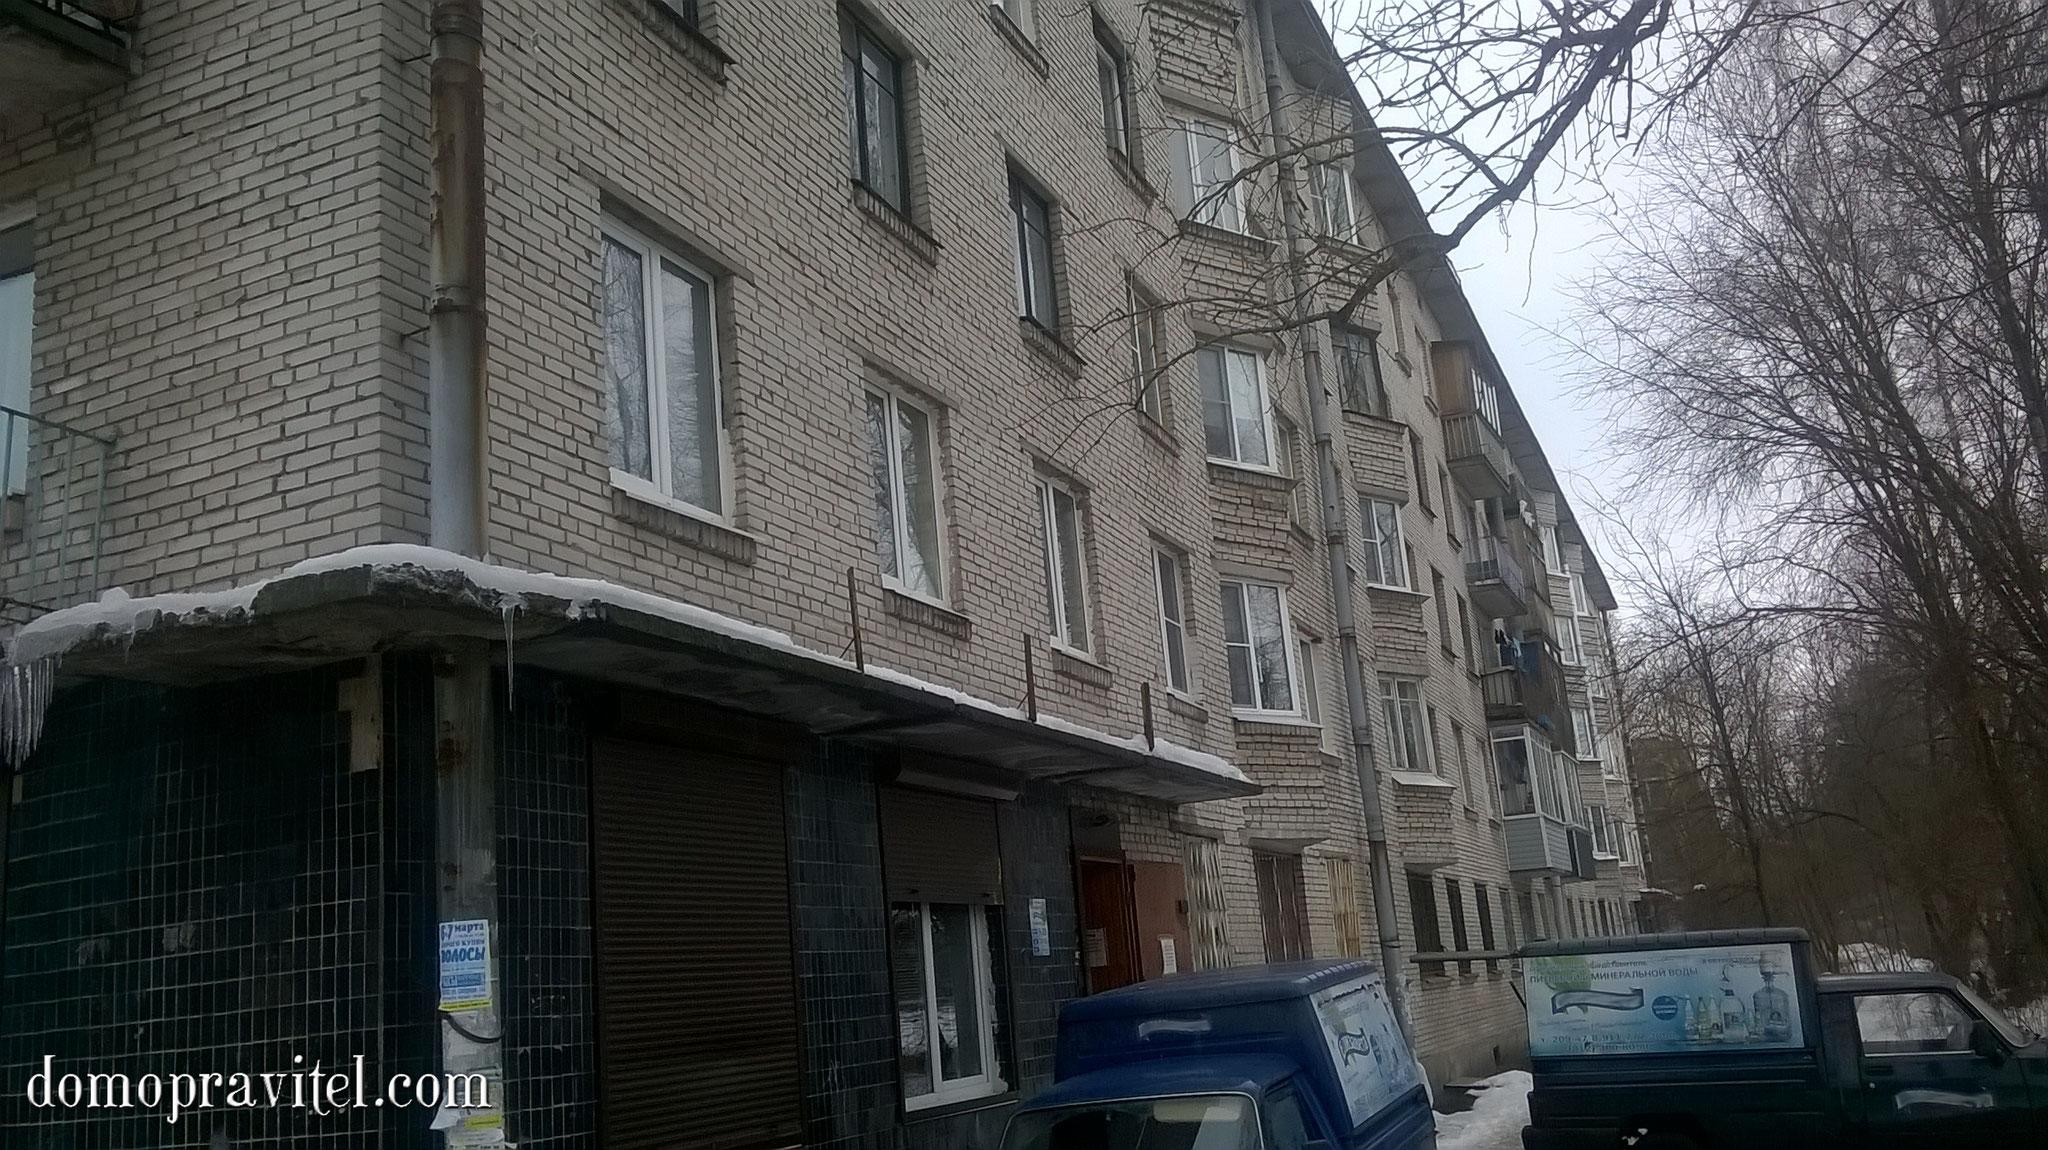 Григорина 11 в Гатчине, фасад дома